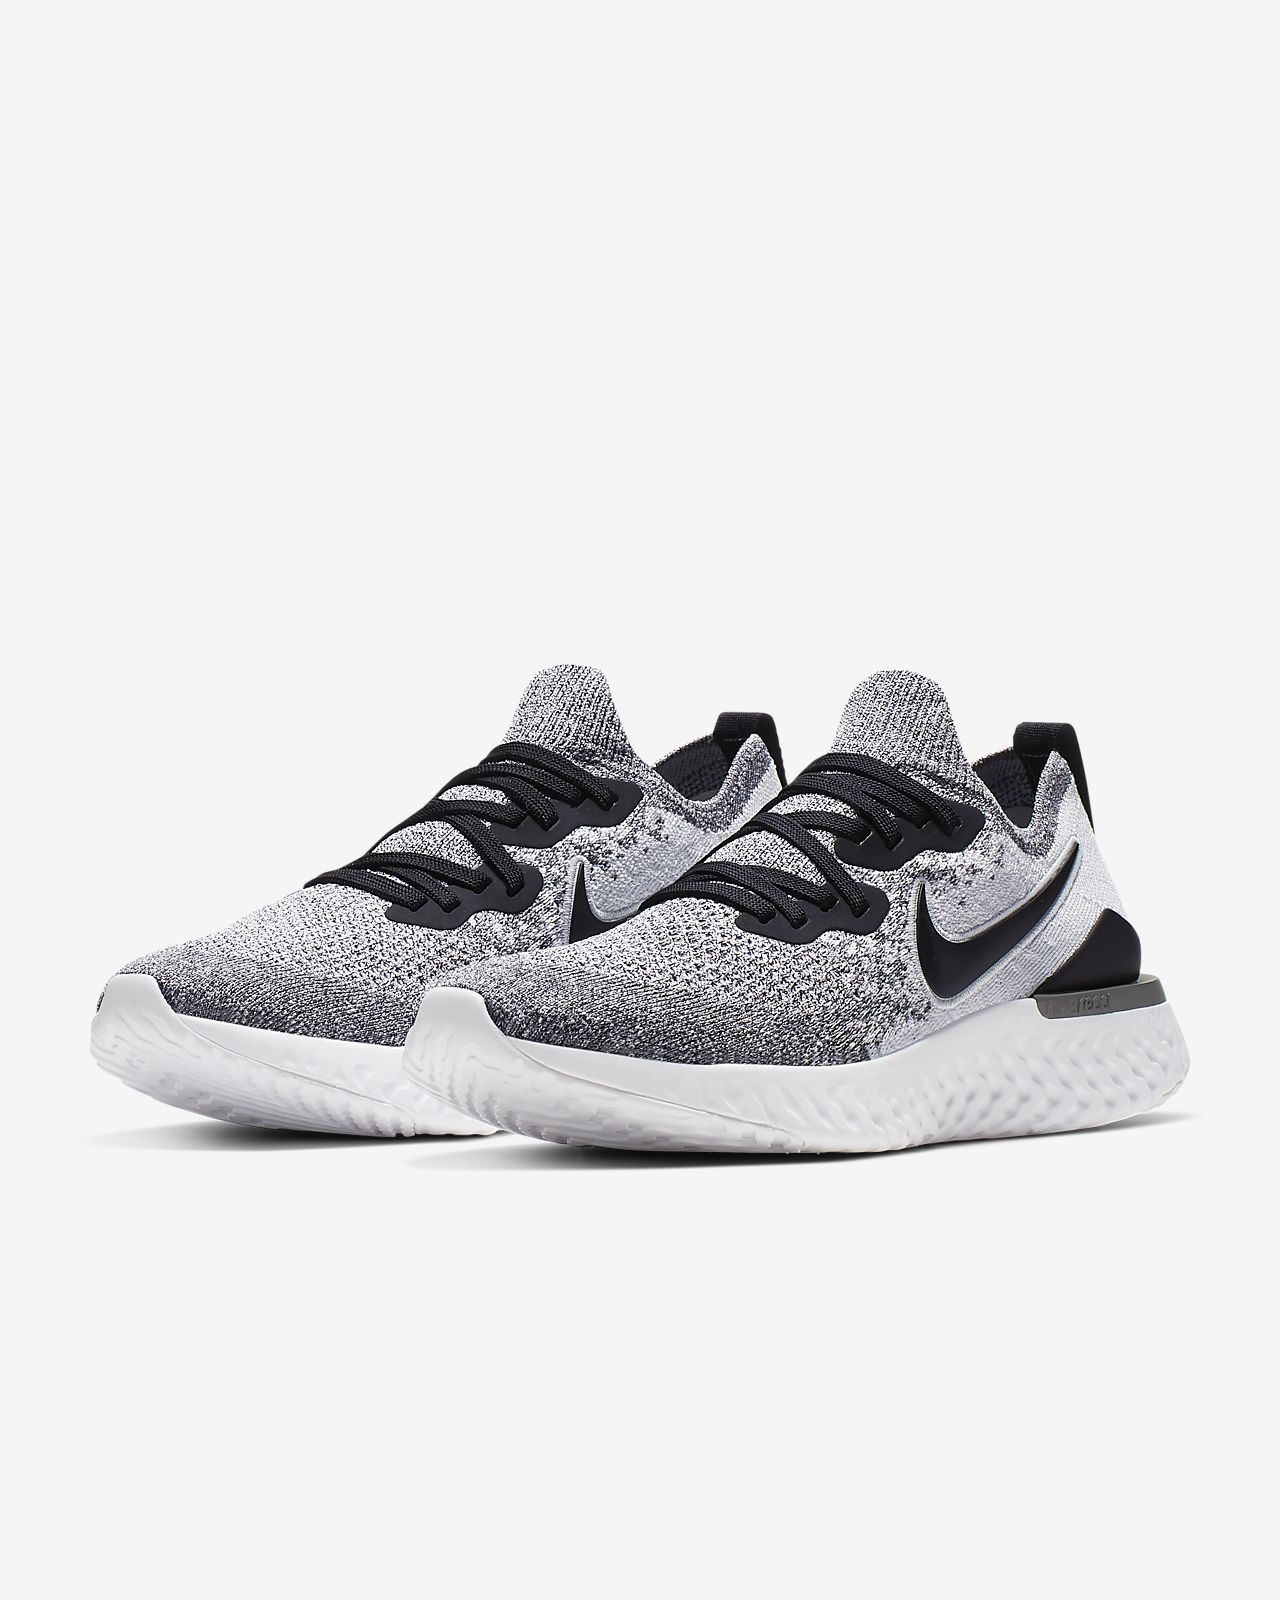 Nike Epic React Flyknit 2 WhiteBlack Pure Platinum